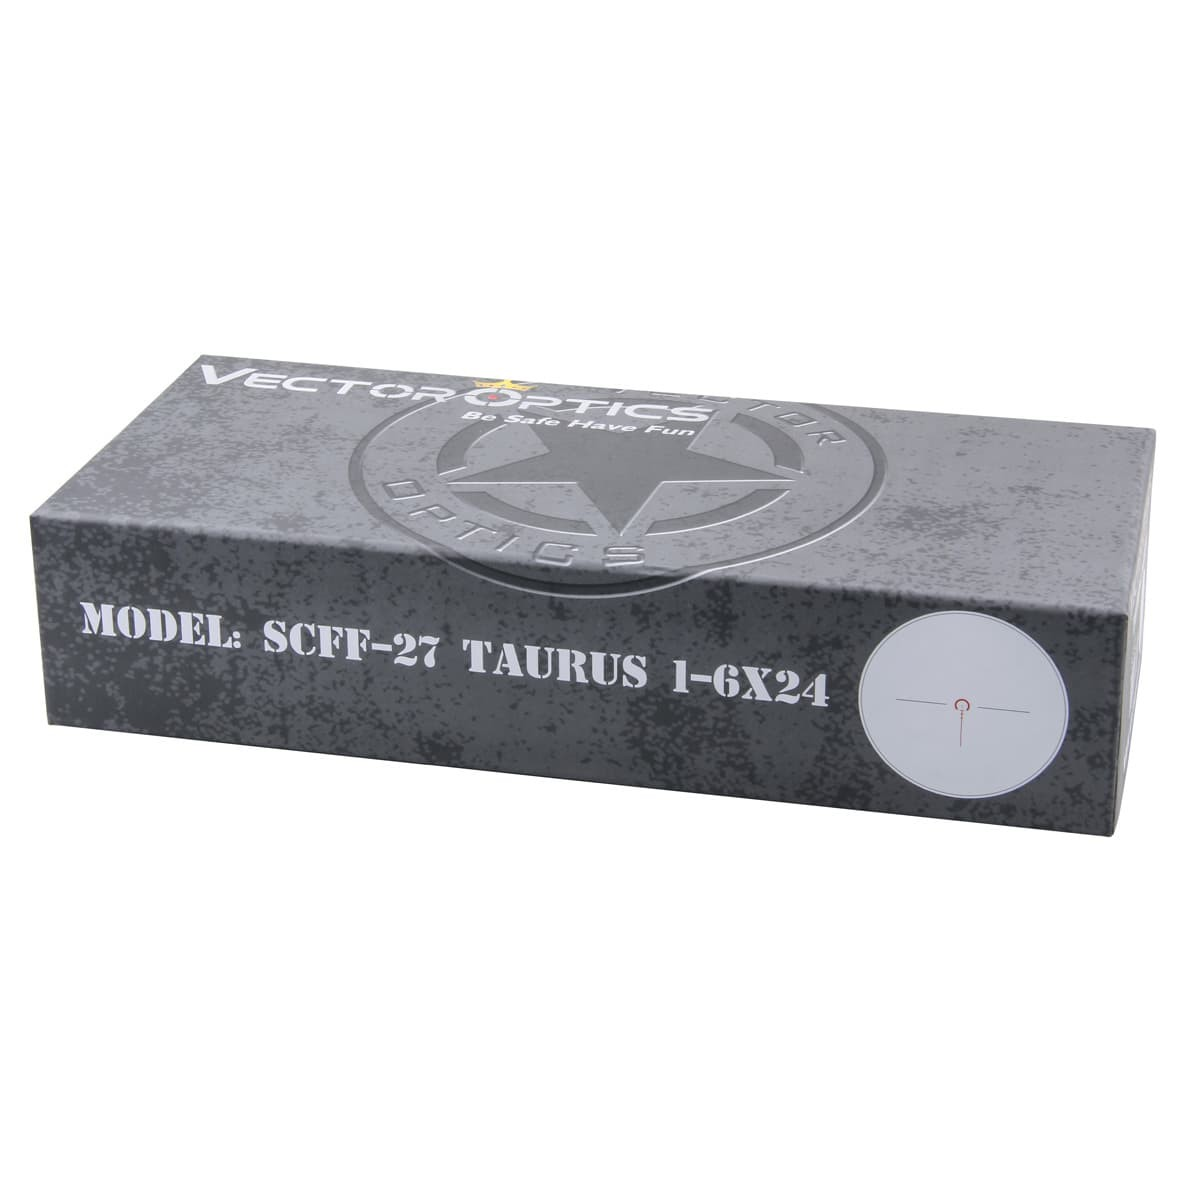 Taurus 1-6x24 SCFF-27